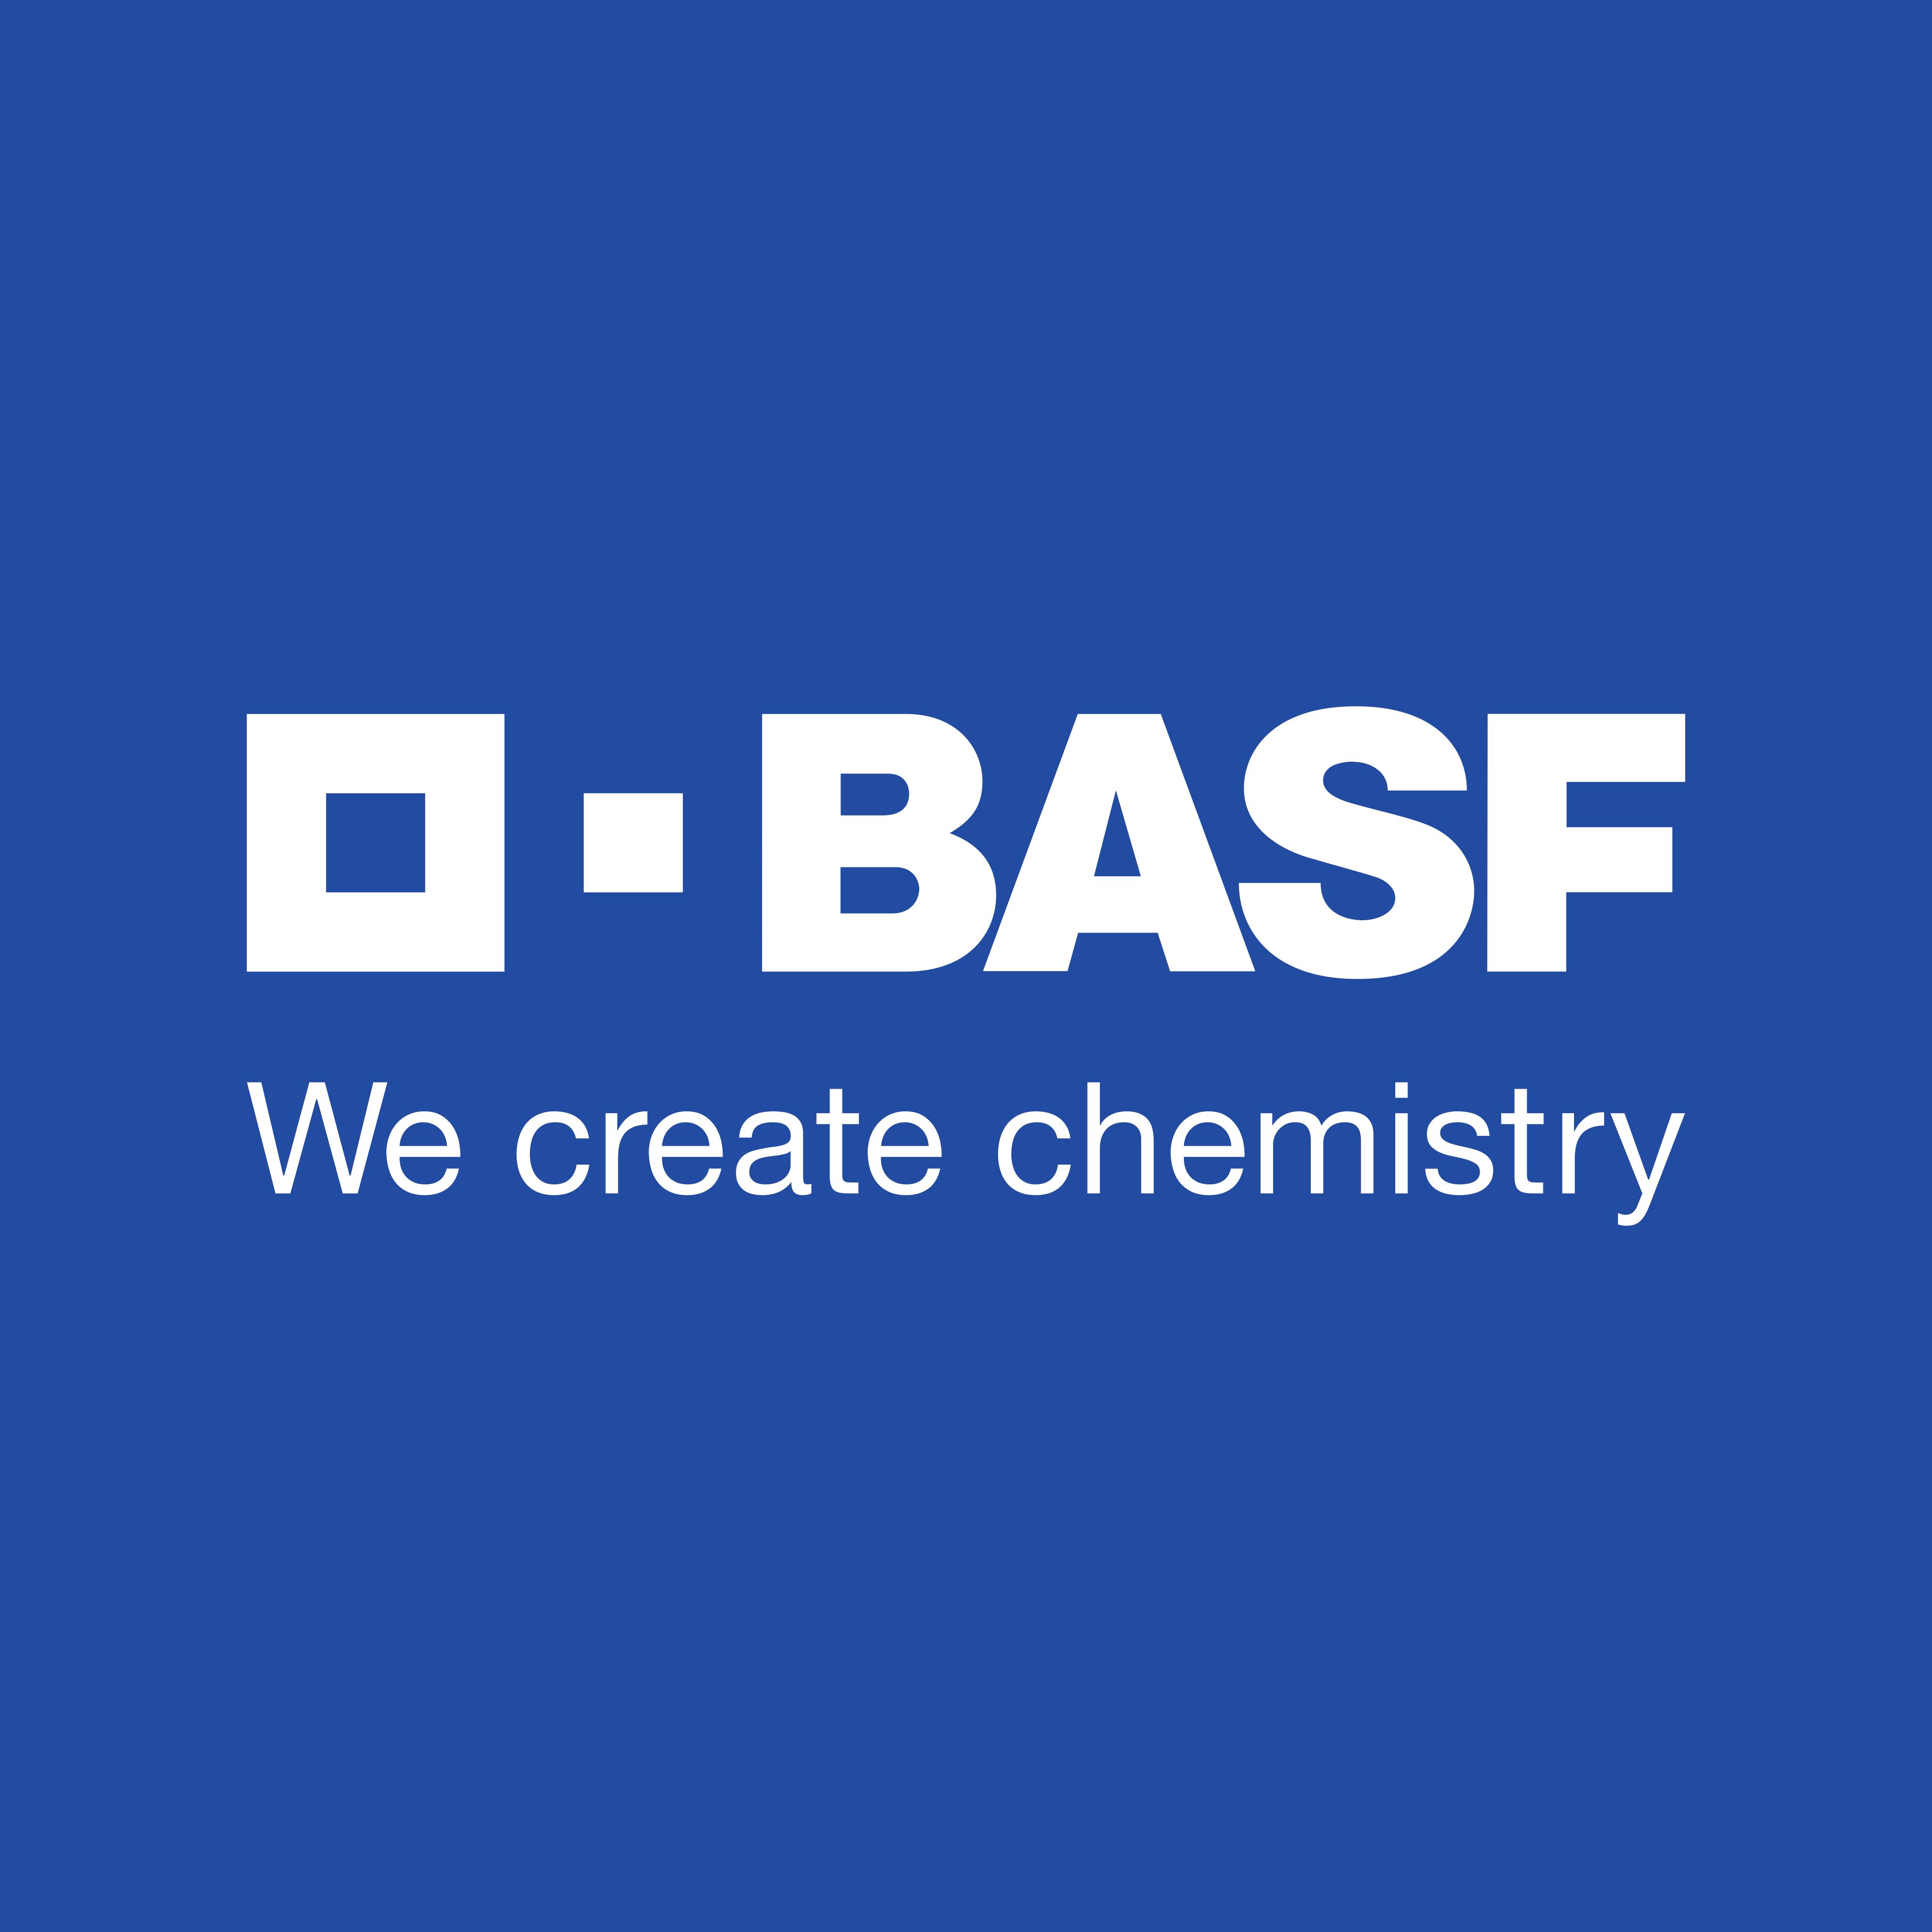 basf logo 0 - BASF Logo